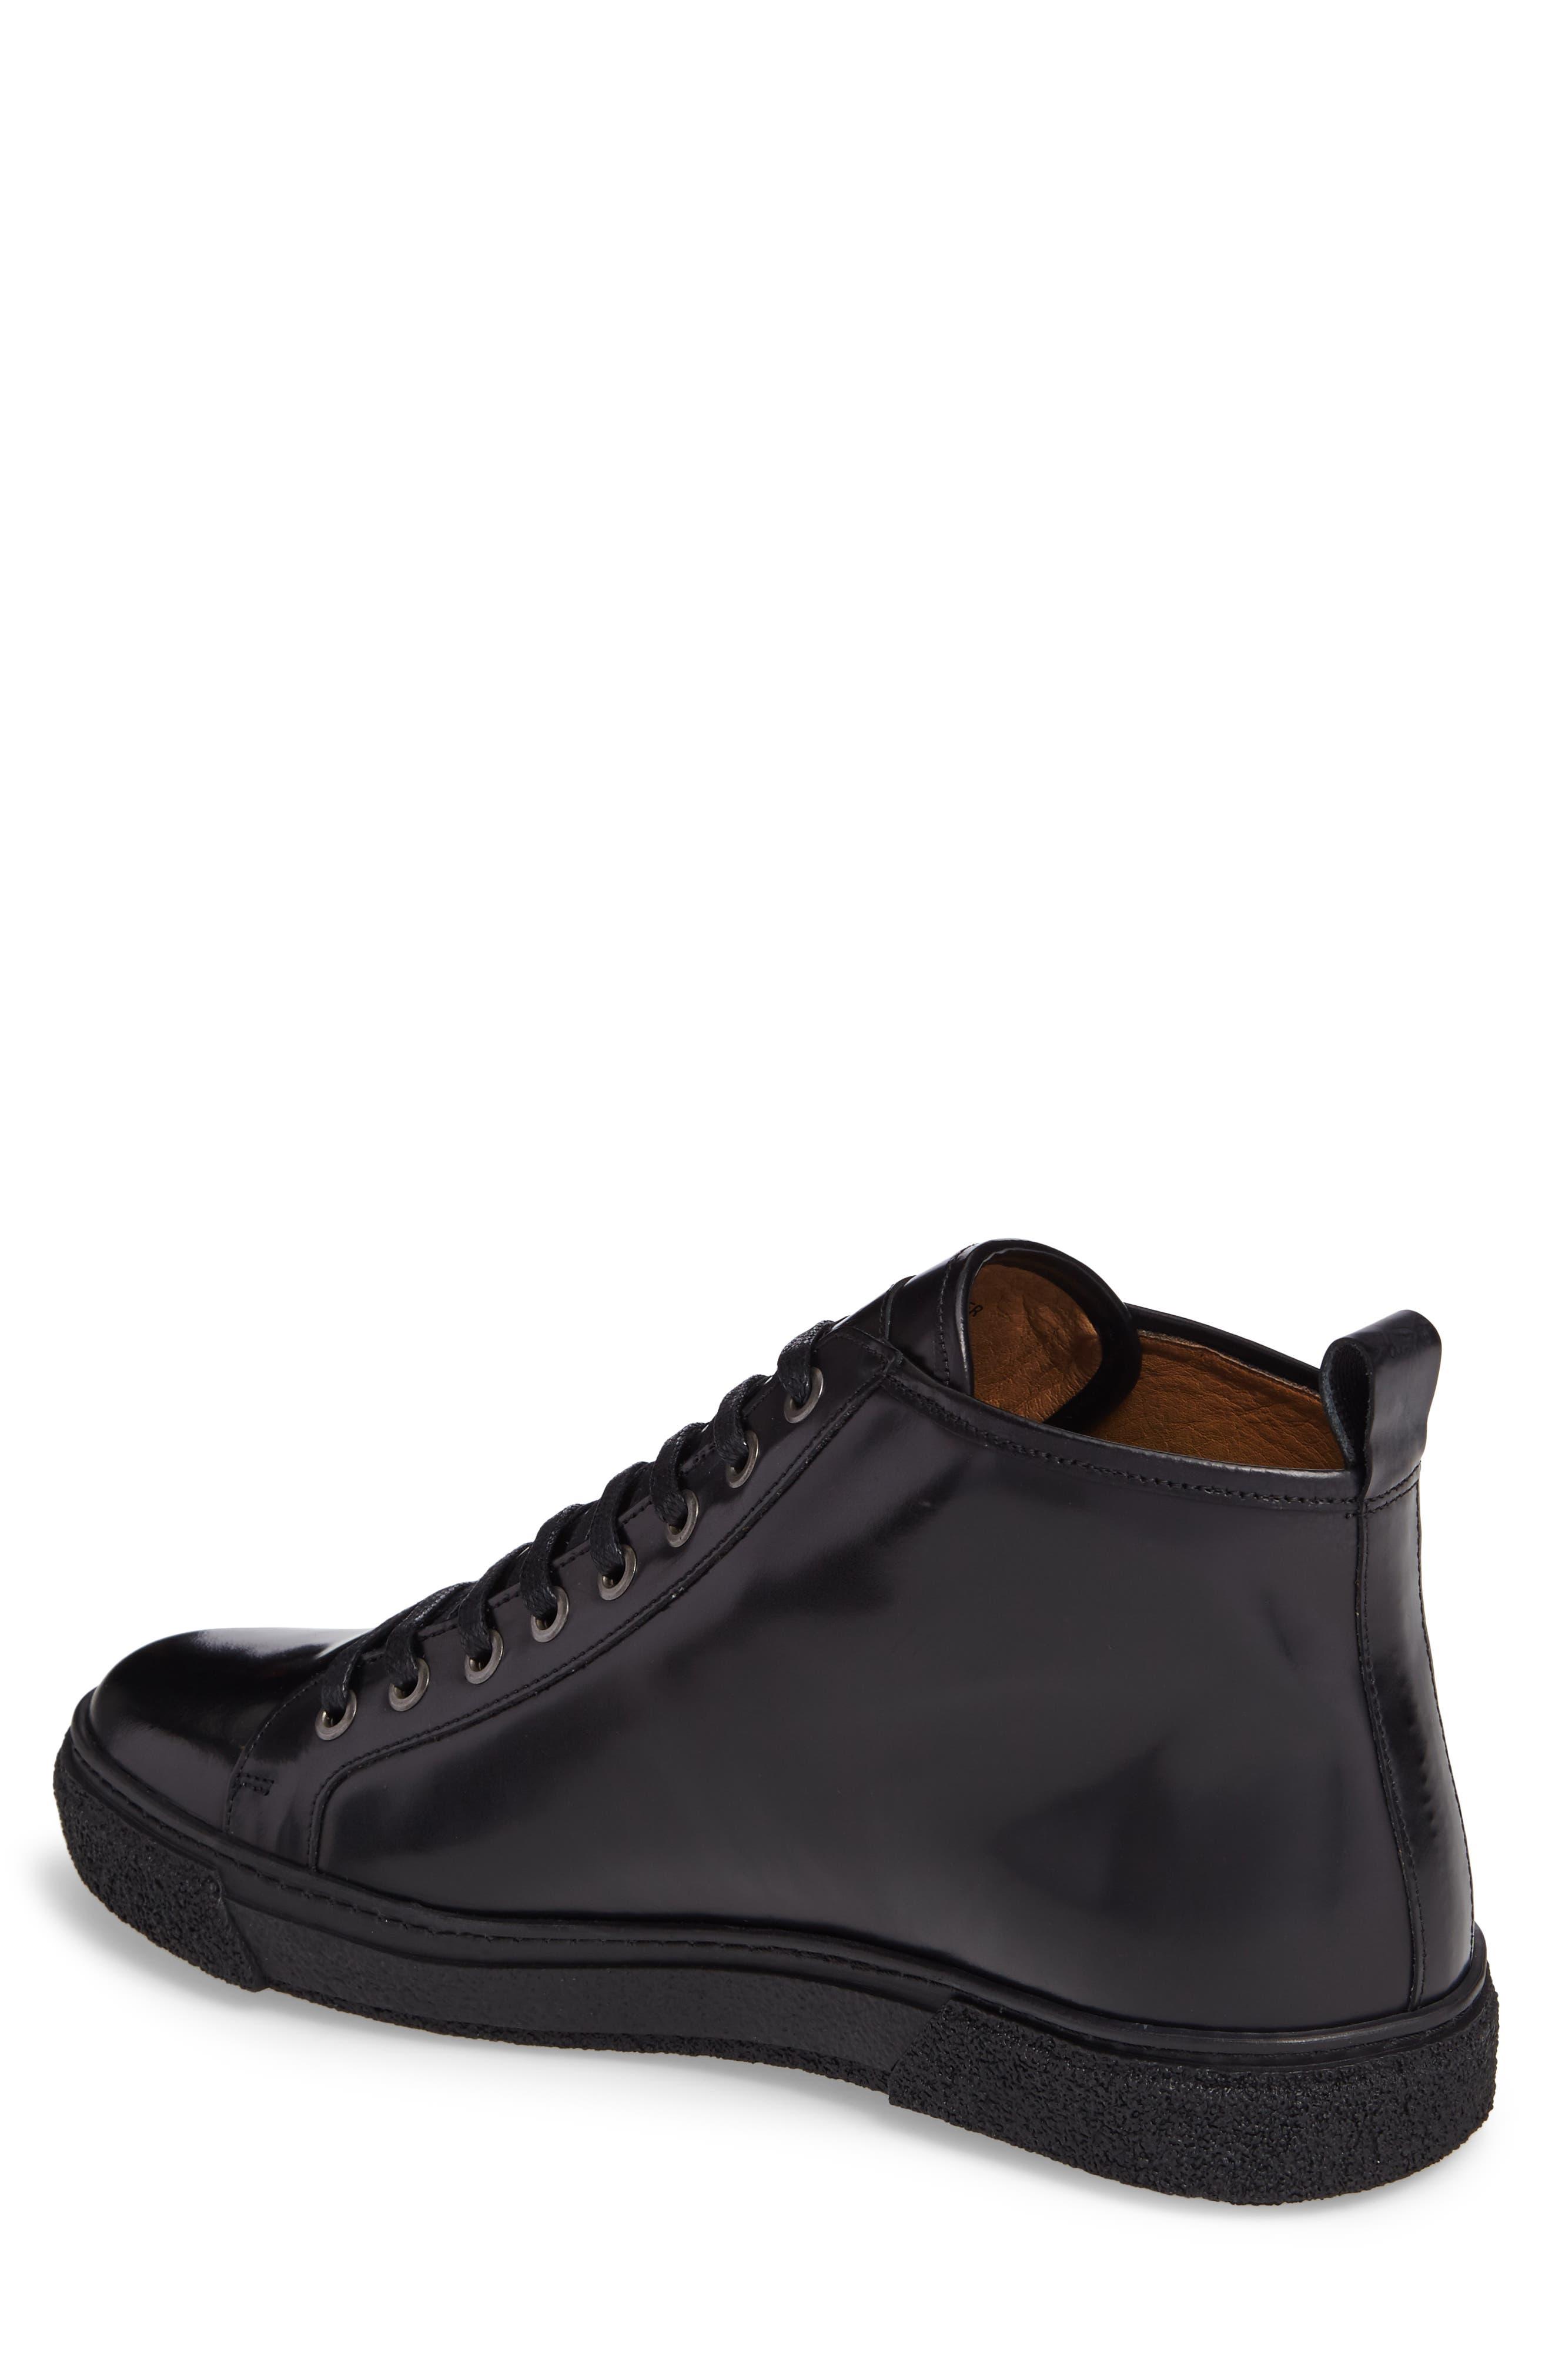 Westan Sneaker,                             Alternate thumbnail 2, color,                             BLACK LEATHER